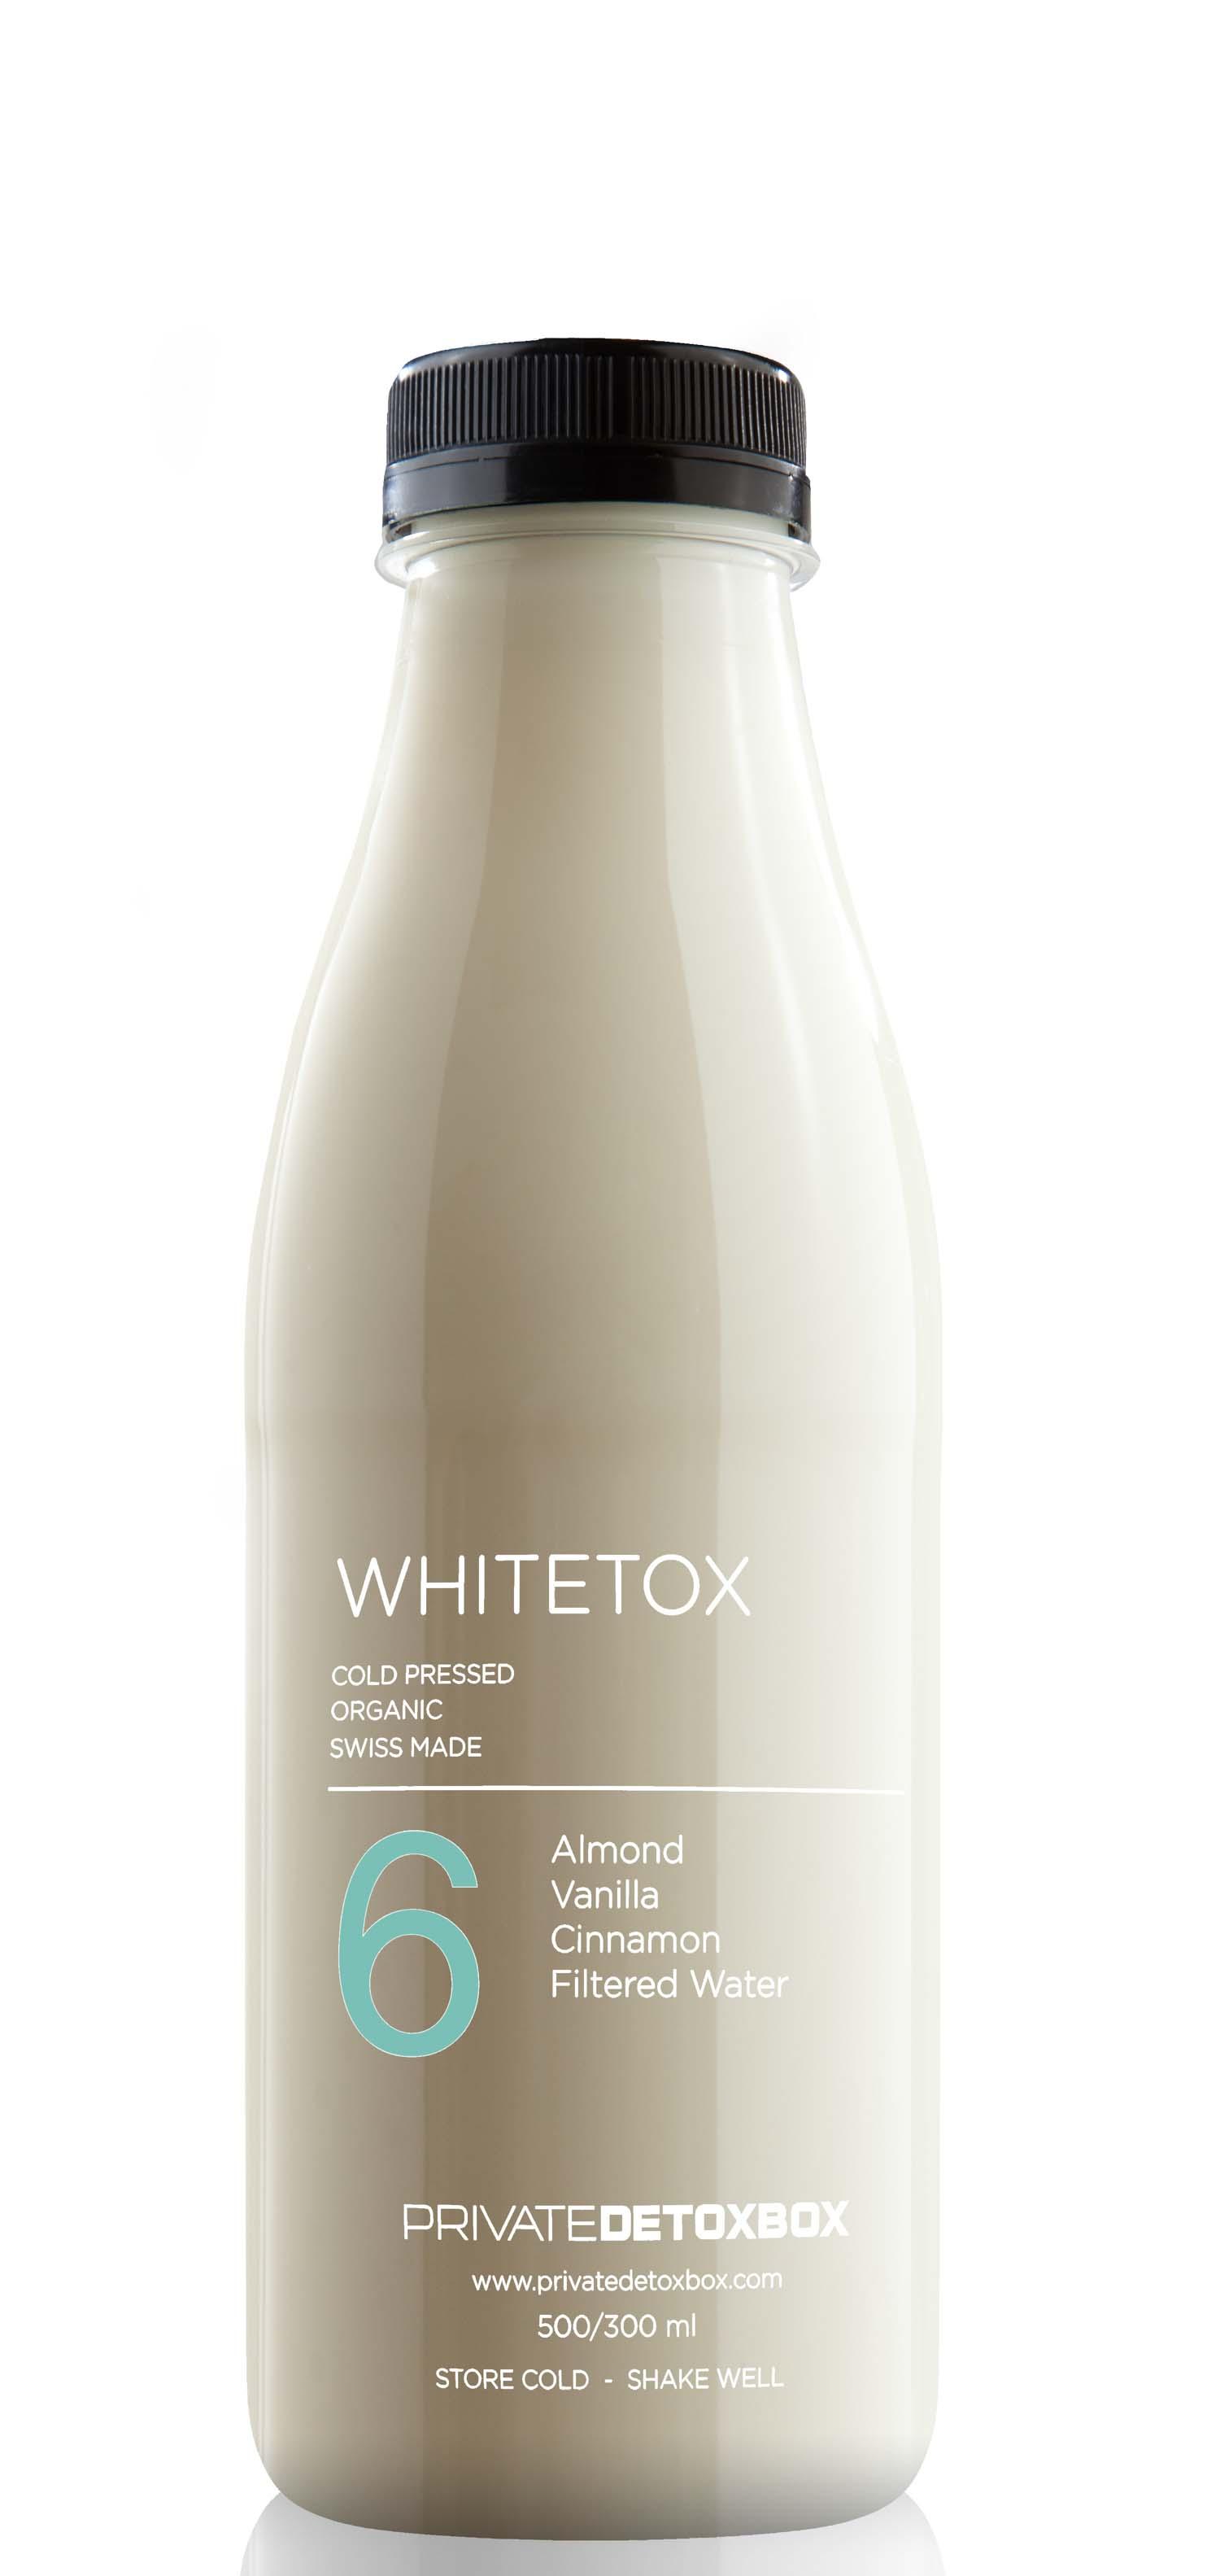 whitetox.jpg